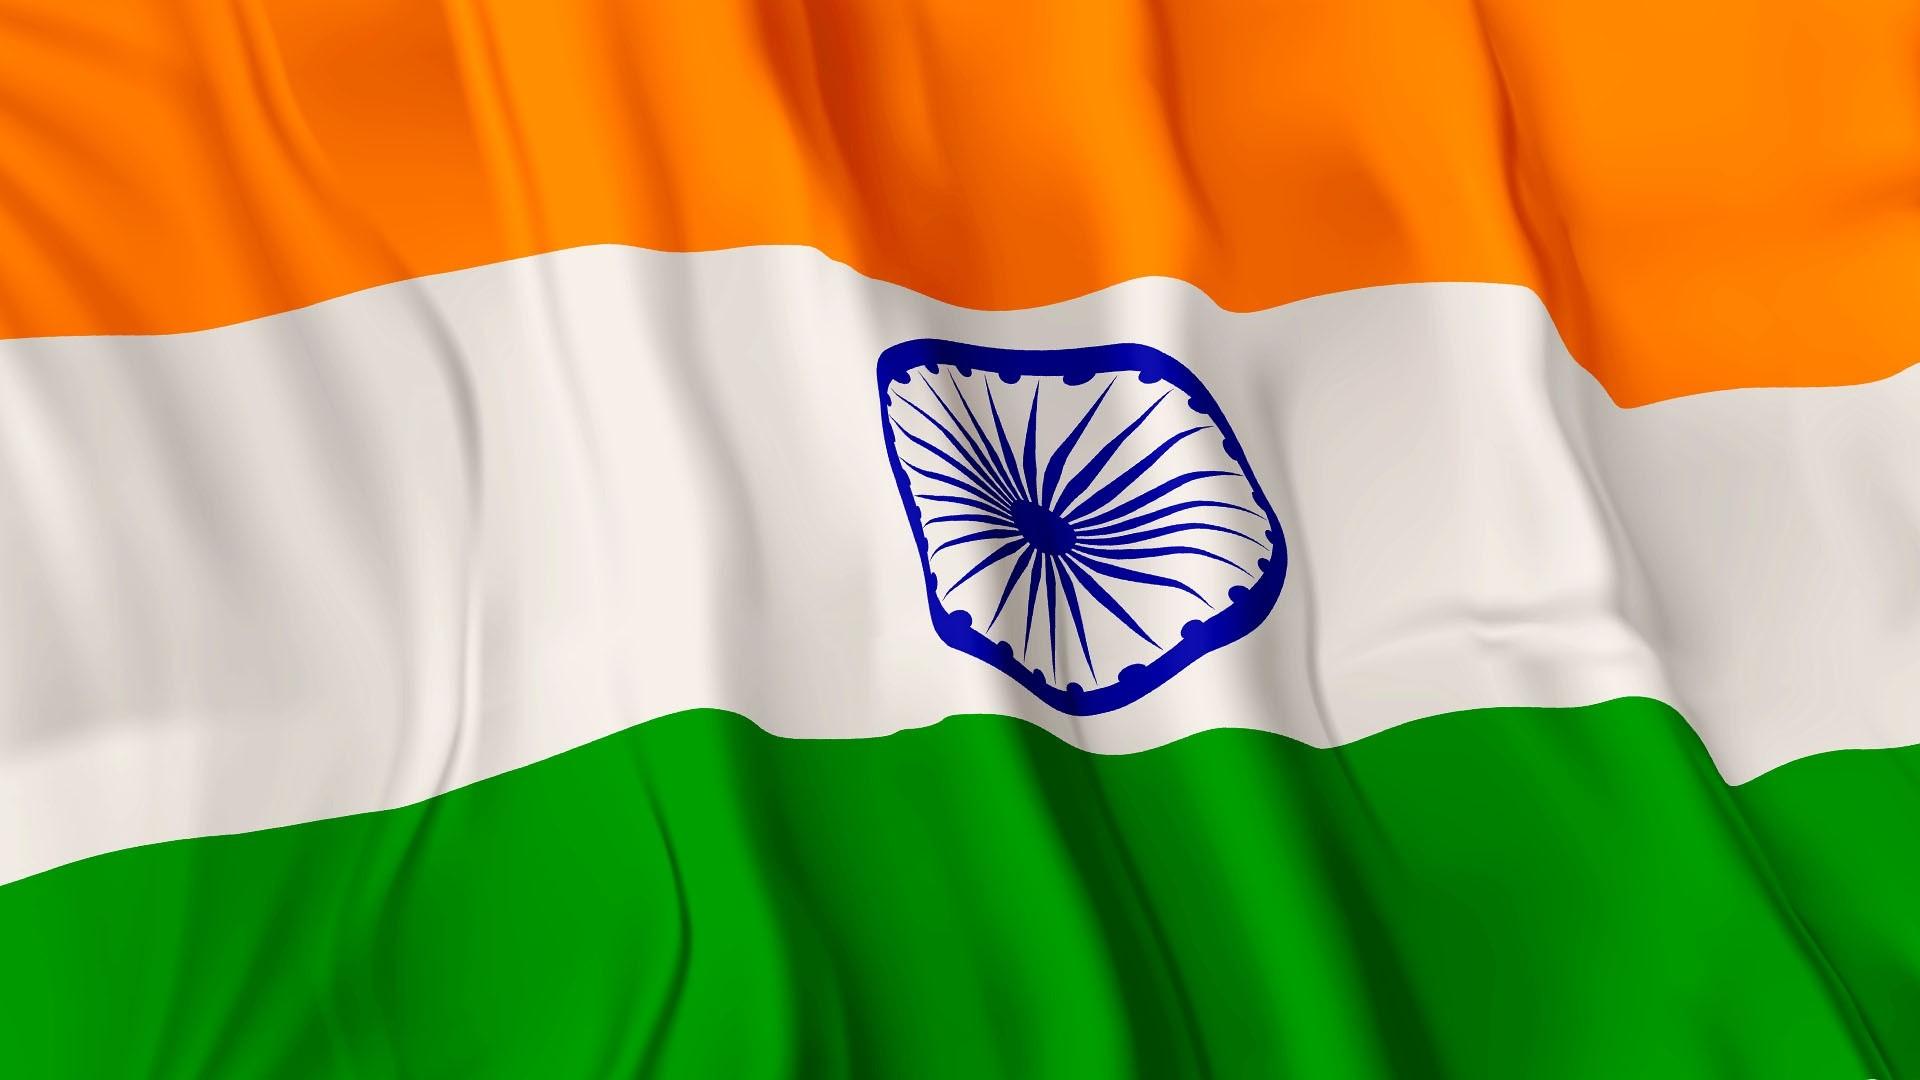 World / Indian Flag Wallpaper